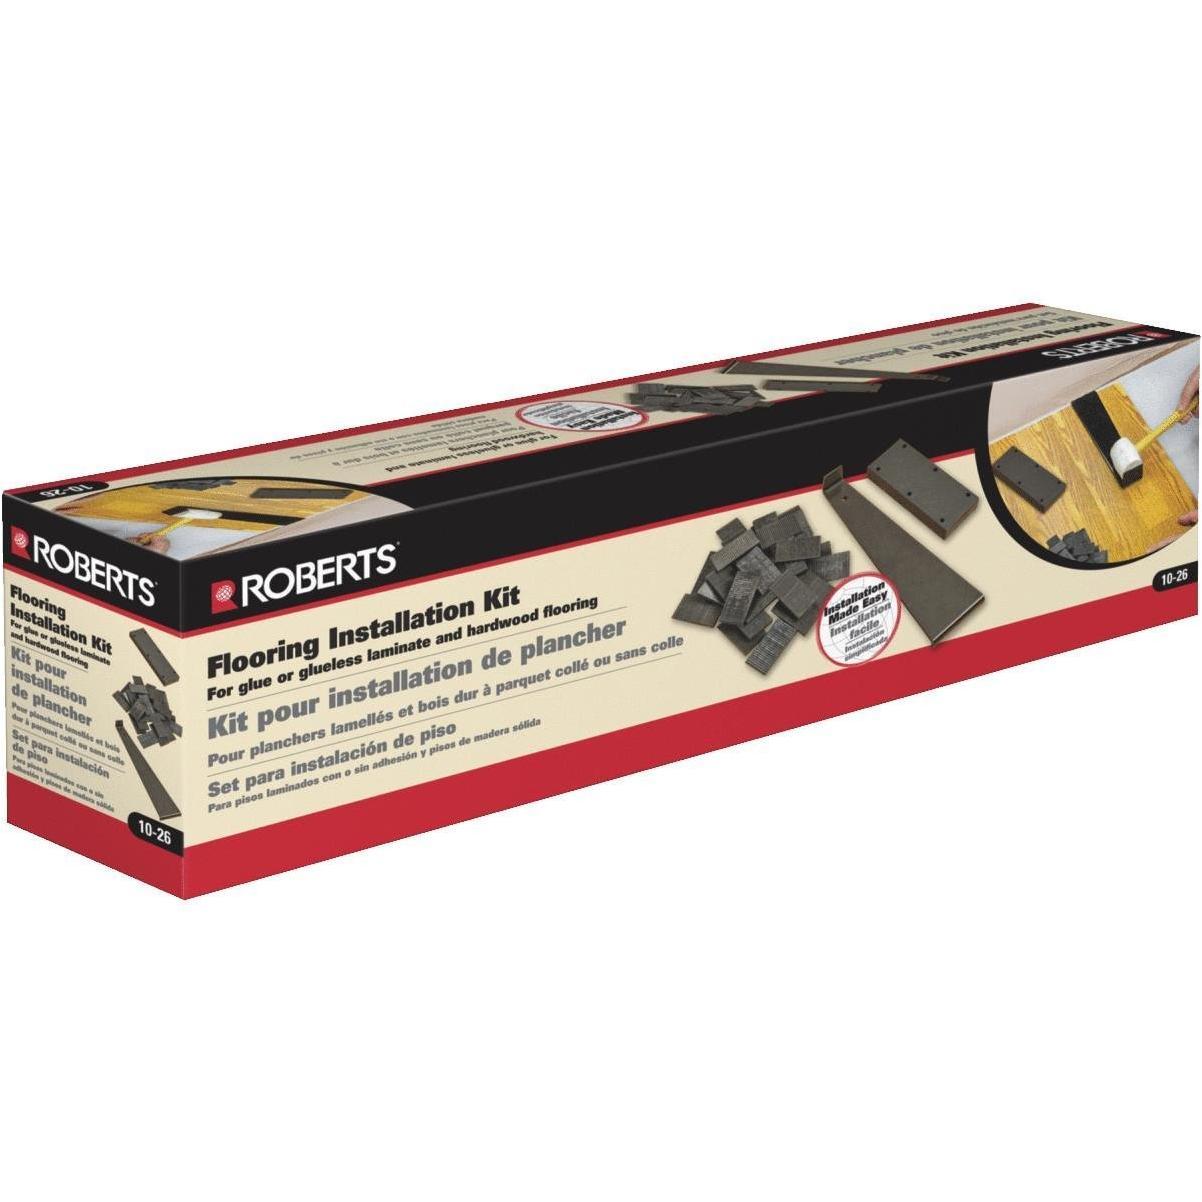 Roberts Glue Less Laminate Flooring, Glueless Laminate Flooring Installation